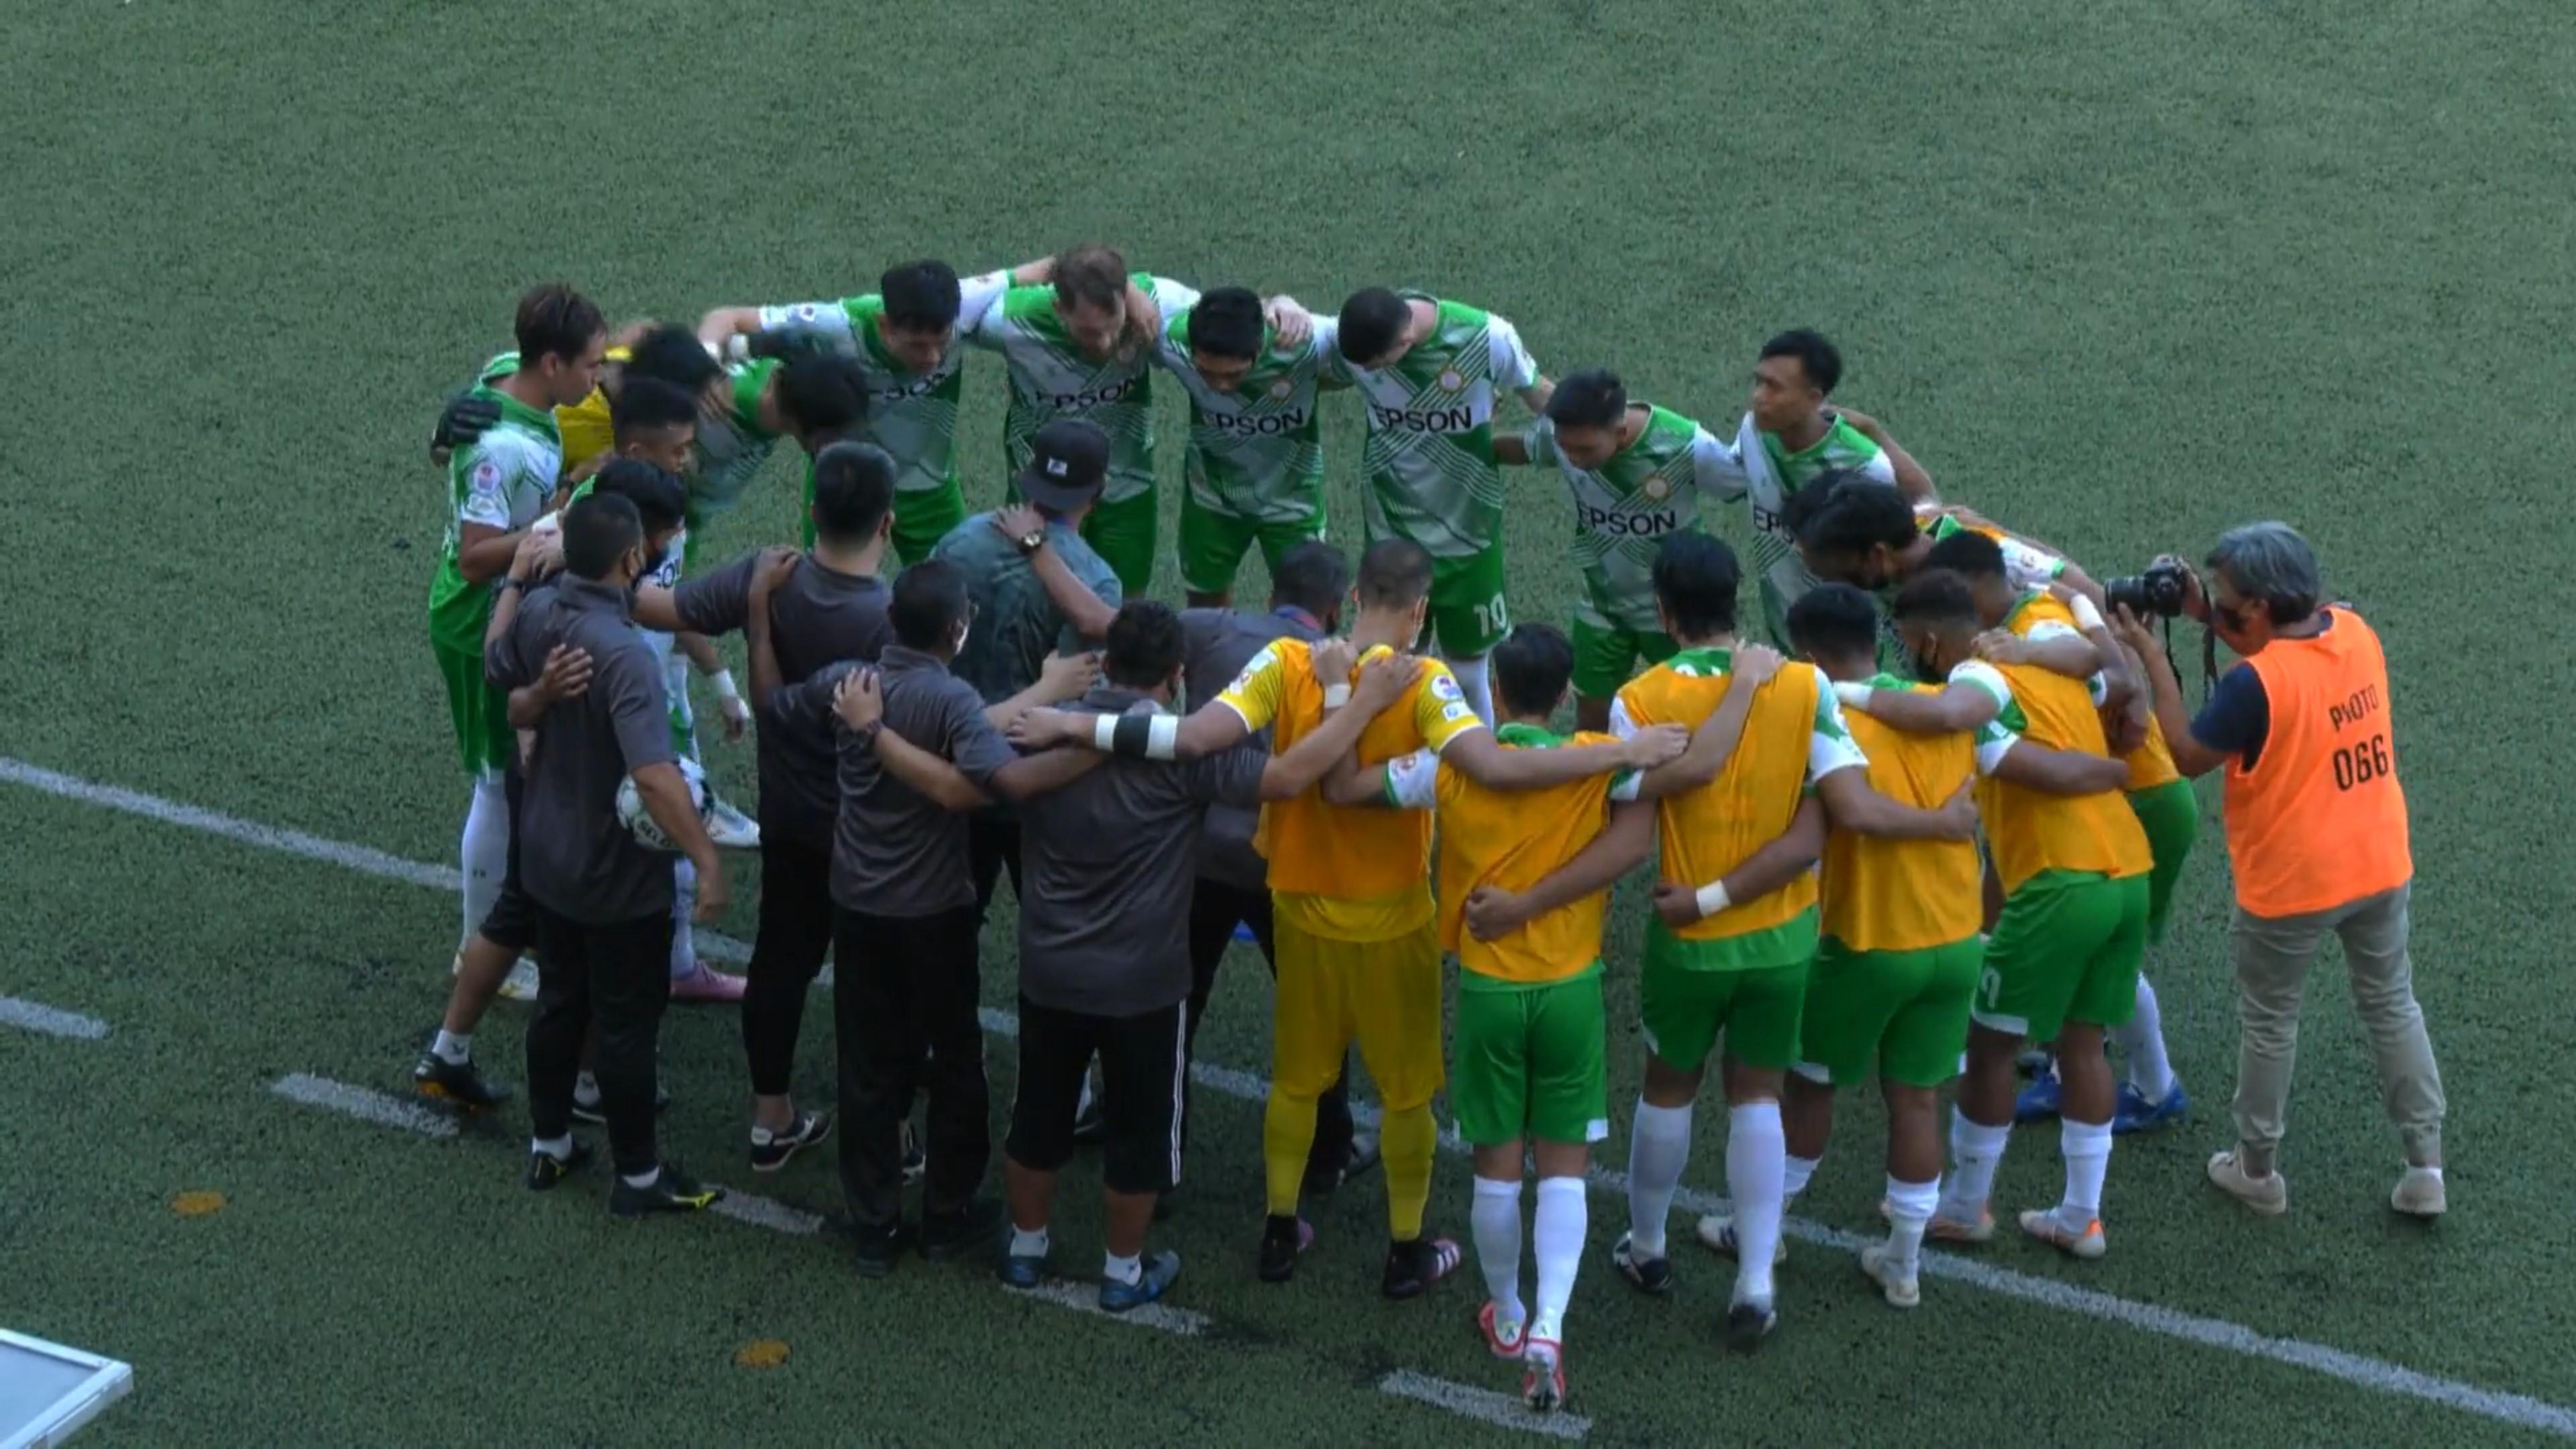 SPL : Geylang International end 3-match losing streak with 3-1 win over Balestier Tigers